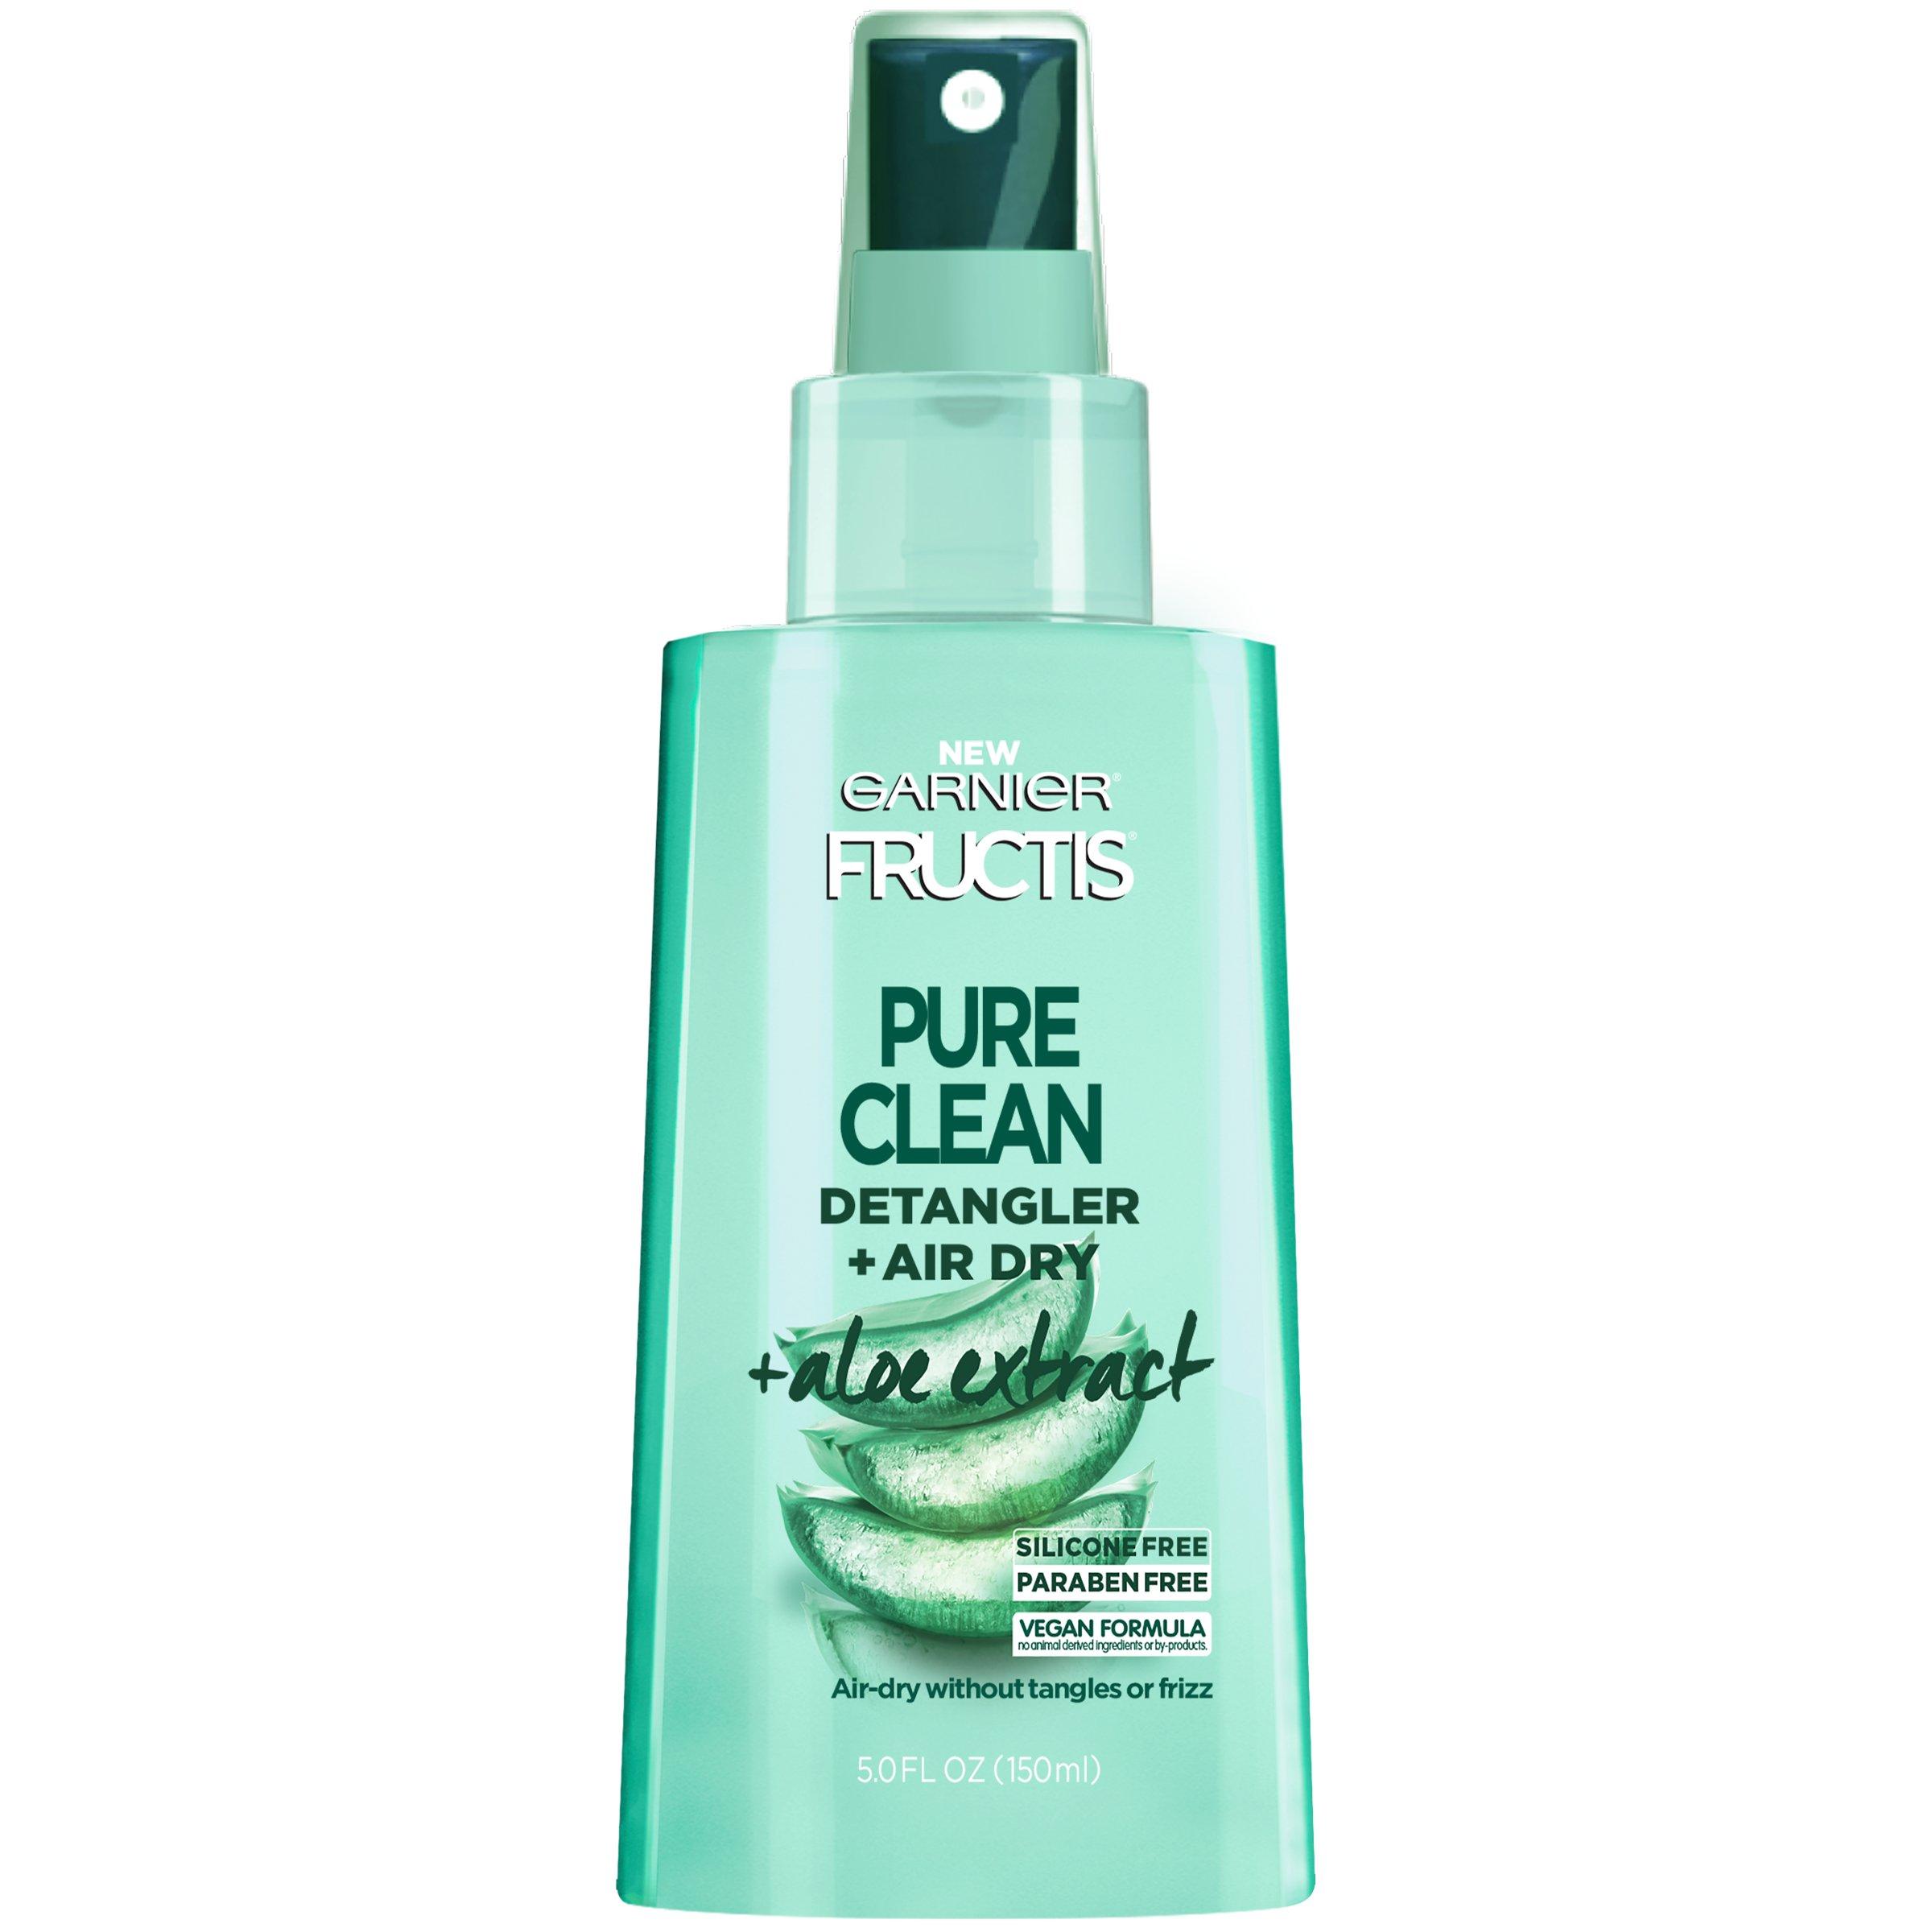 Garnier Fructis Style Pure Clean Detangler + Air Dry, 5 fl. oz.